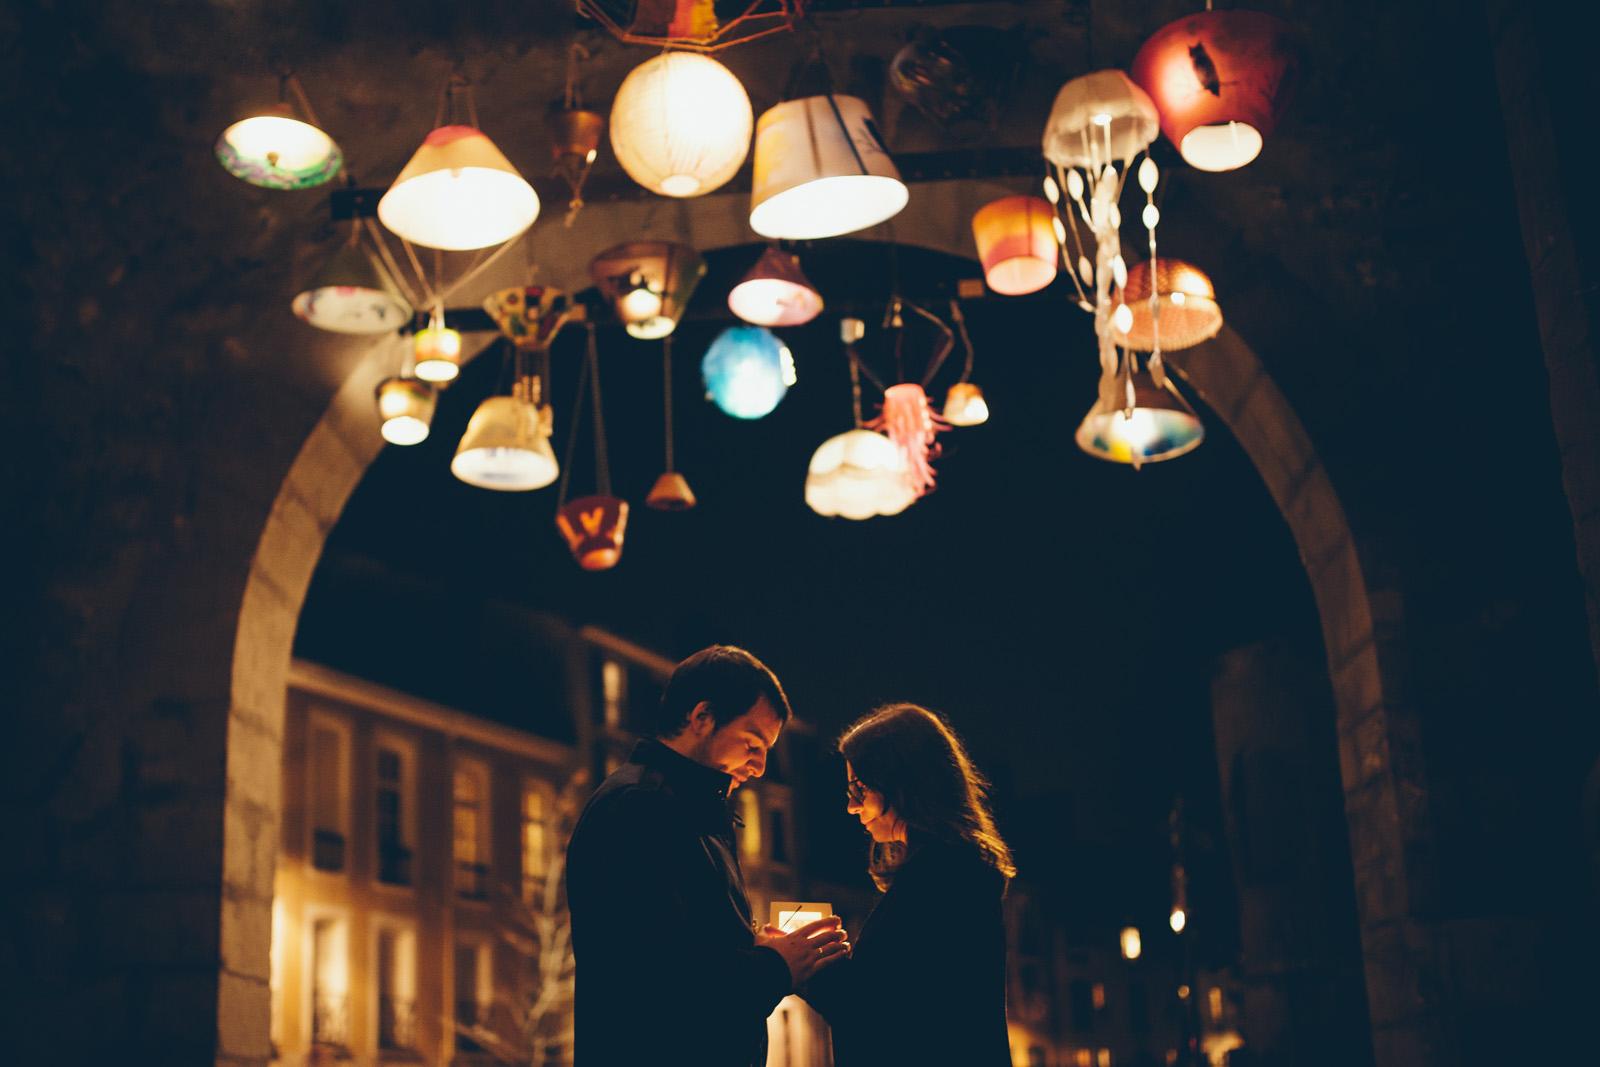 photographe-couple-intimiste-001